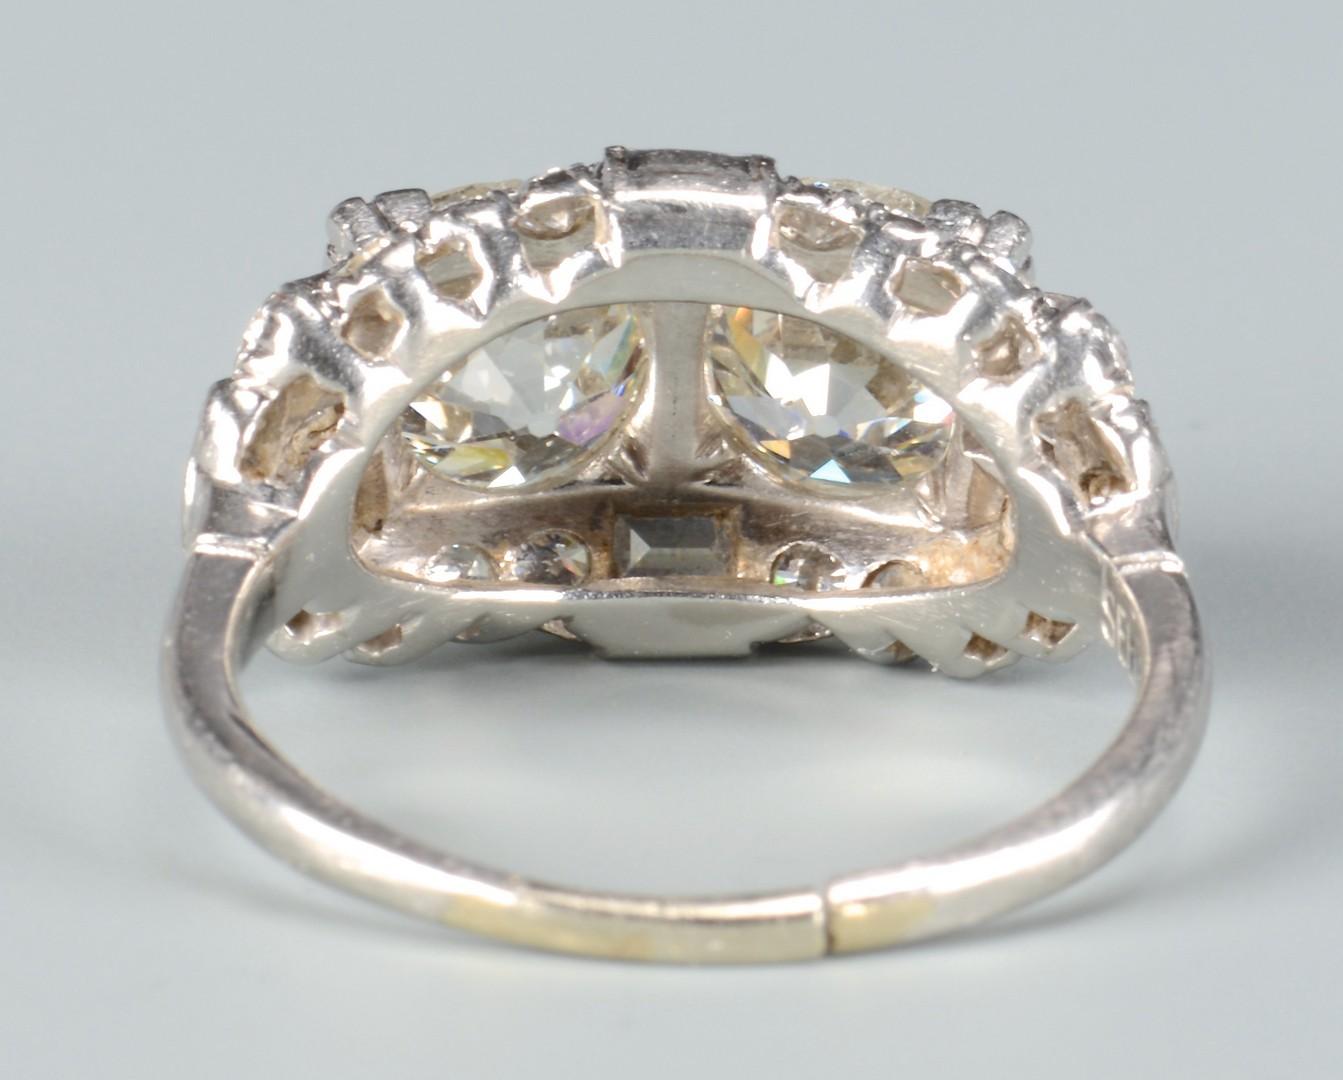 Lot 103: Vintage Old European Cut Dia Ring